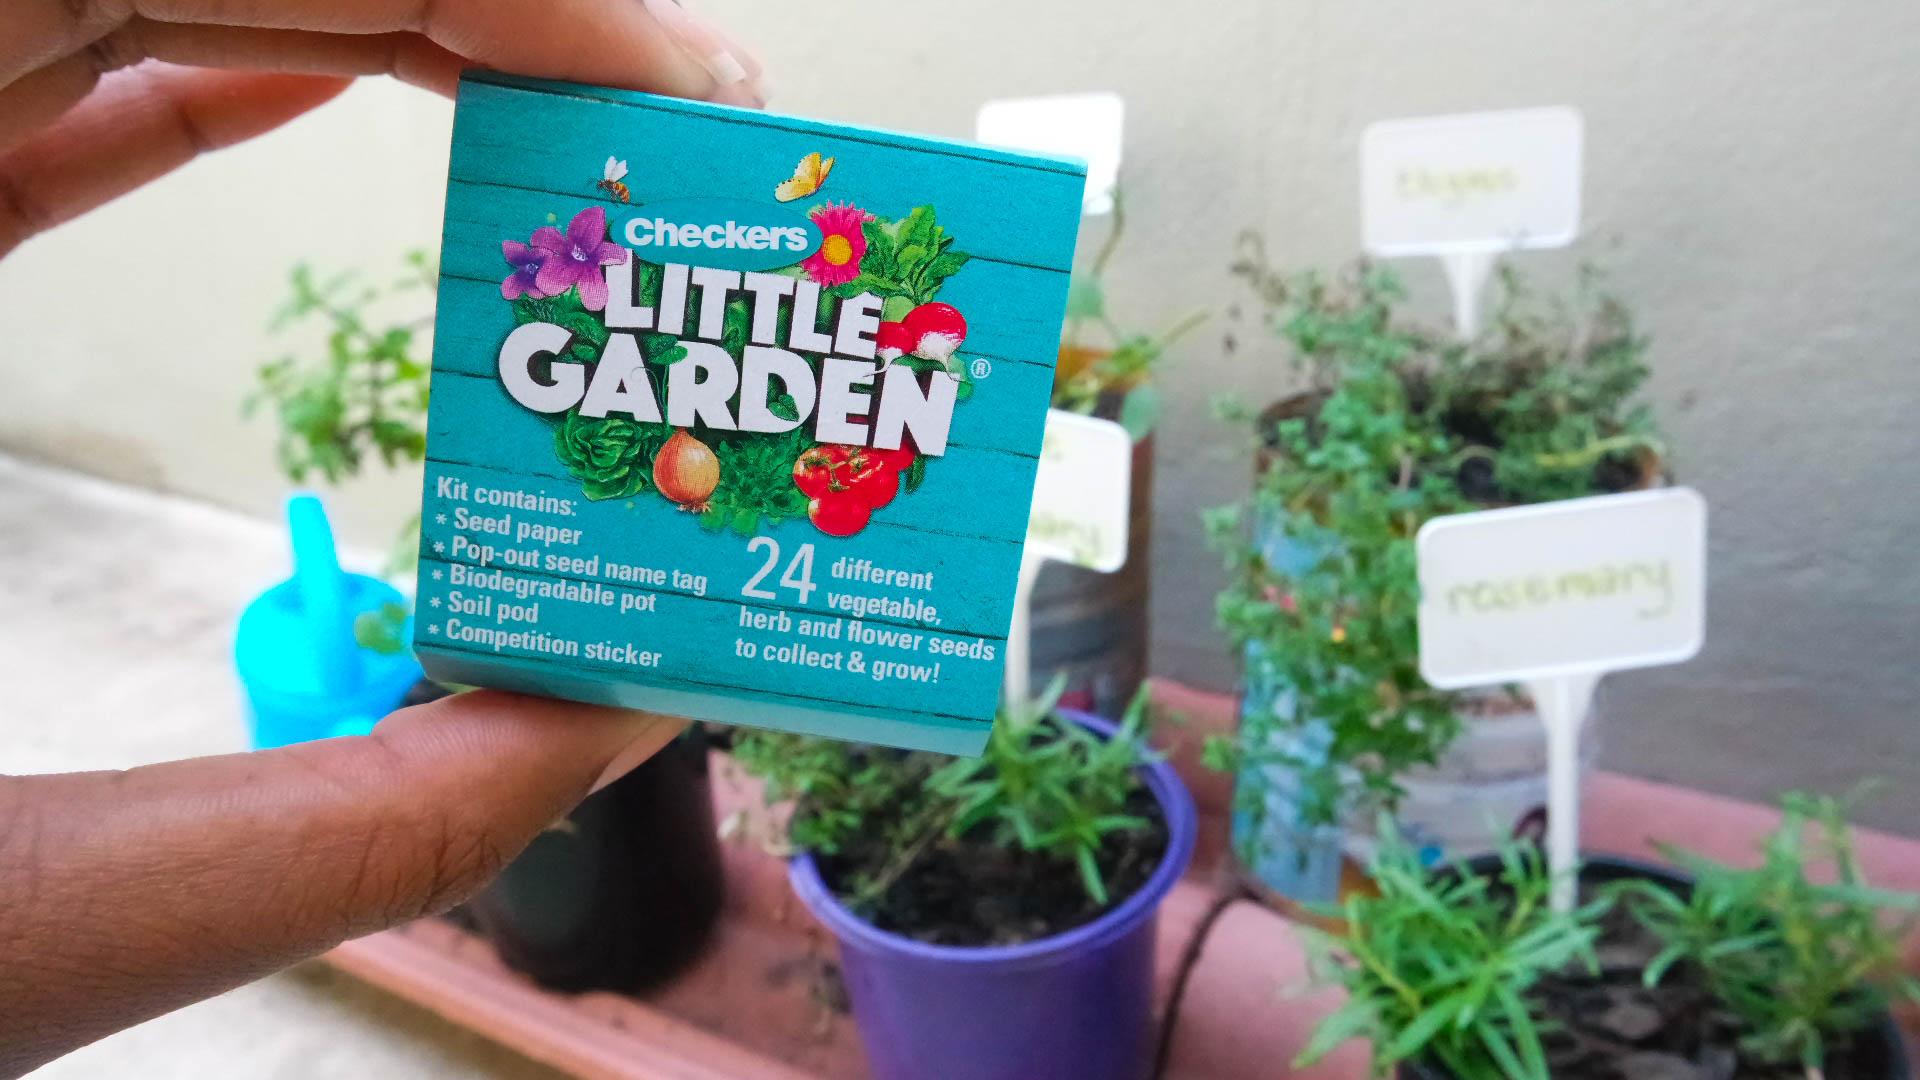 checkers little garden #checkerslittlegarden